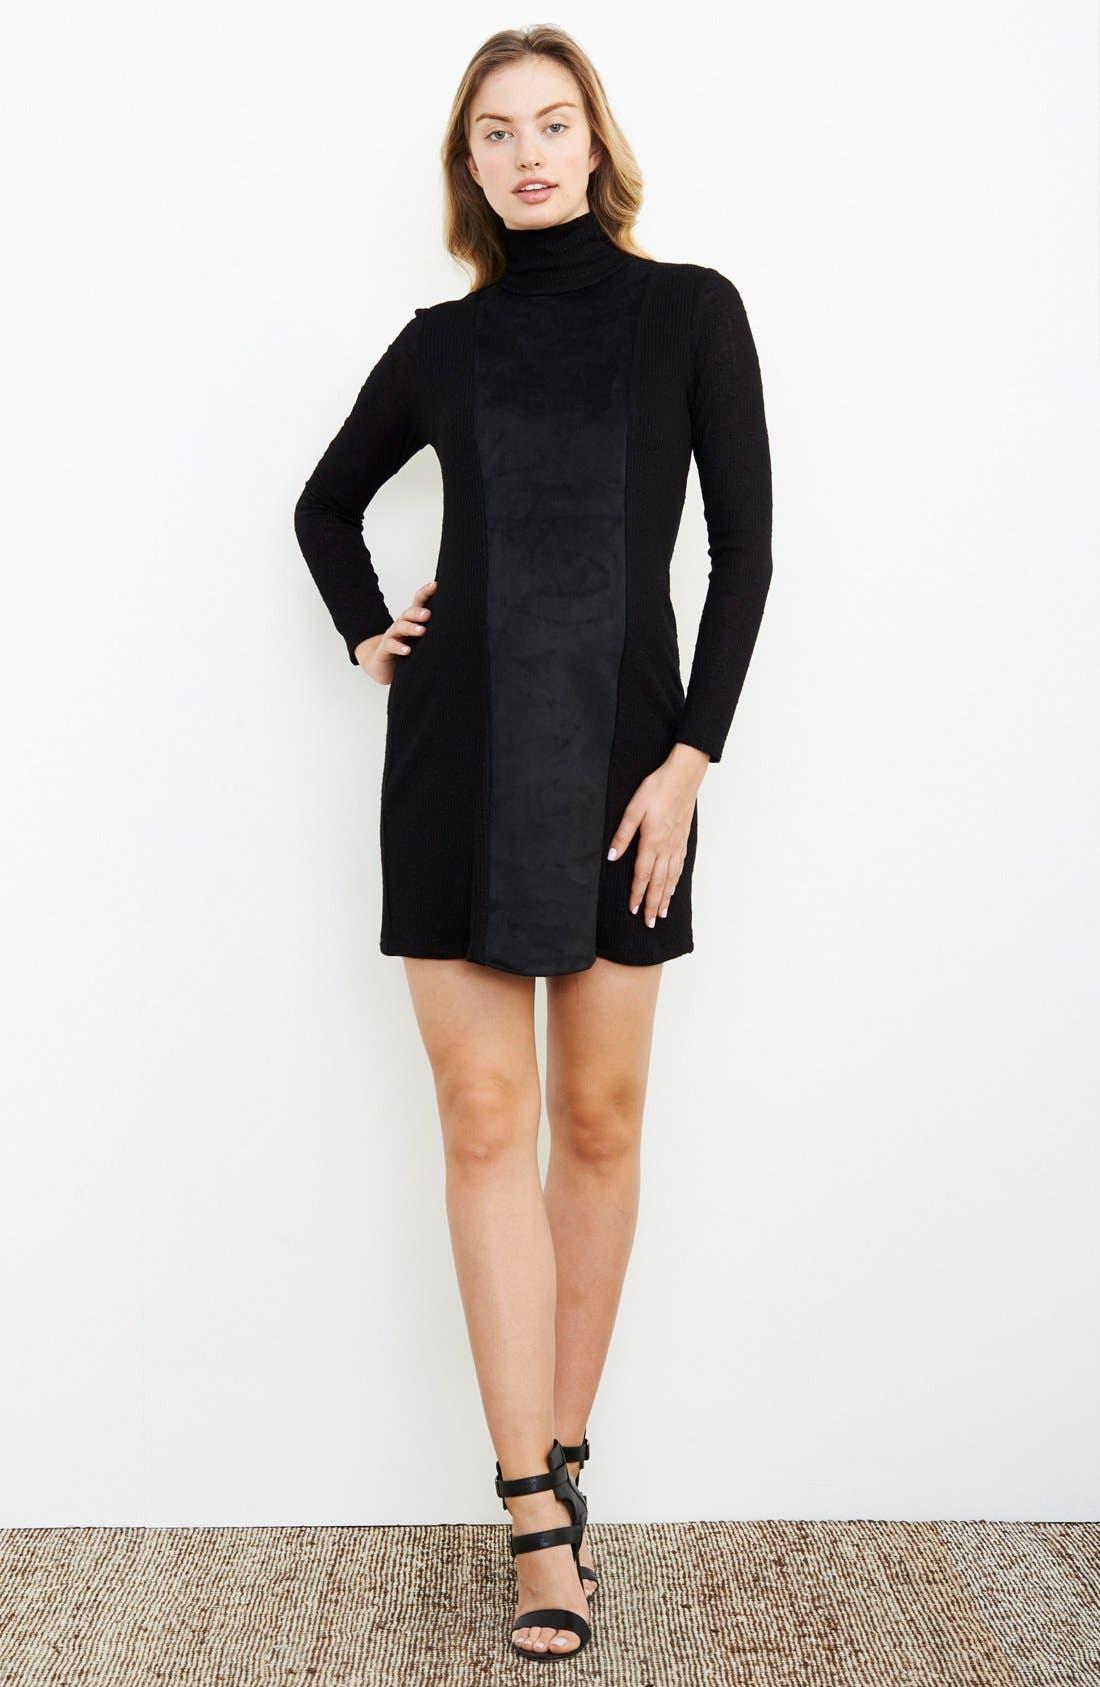 Turtleneck Maternity Dress,                         Main,                         color, Black